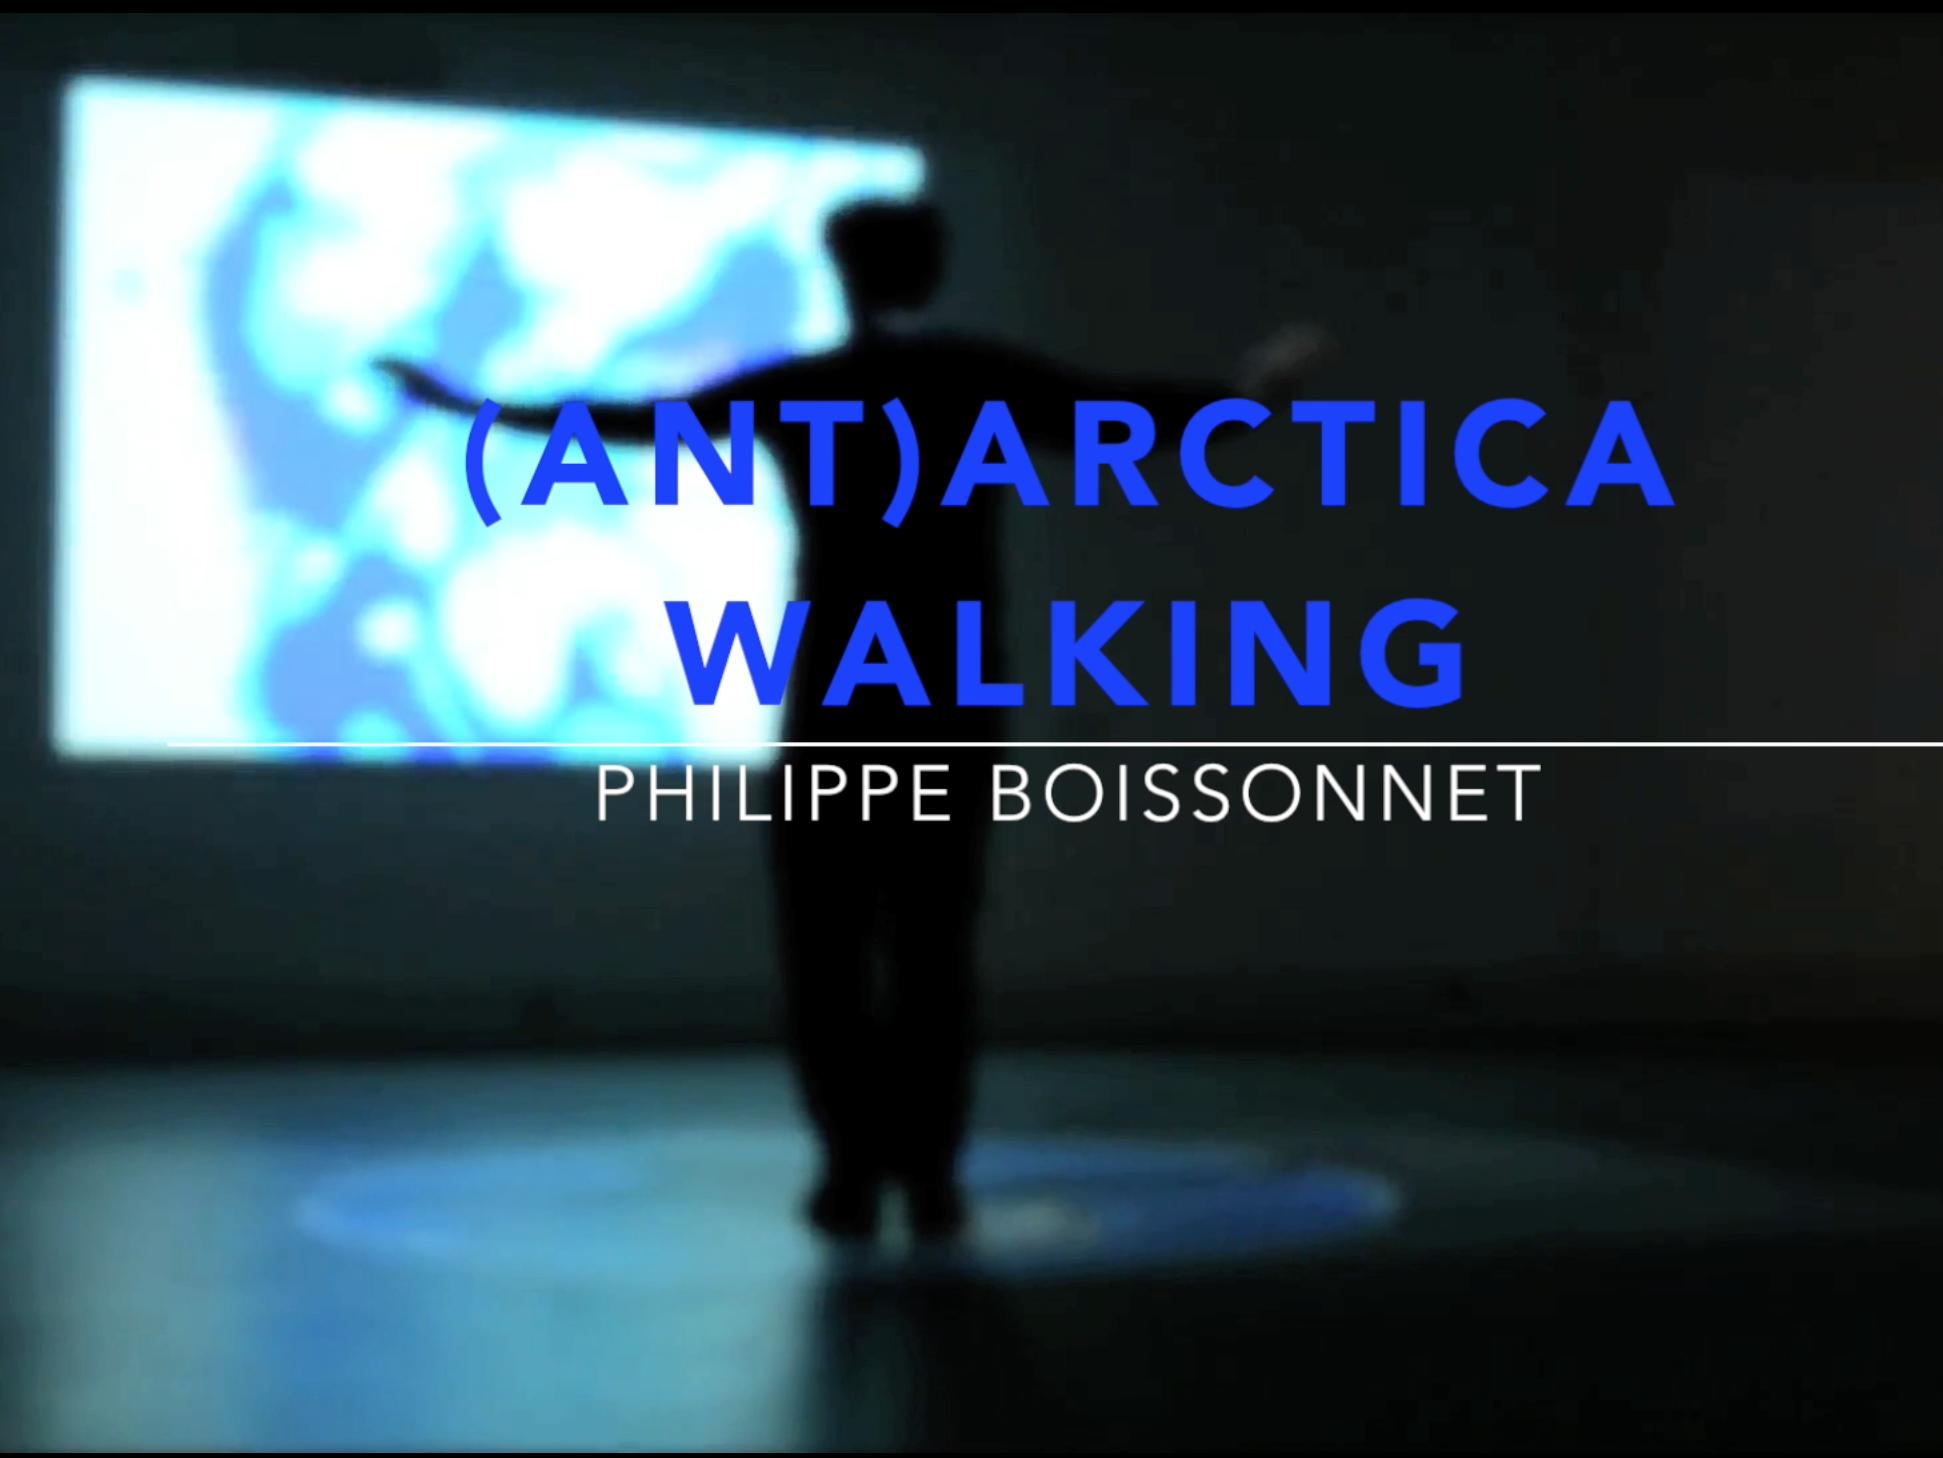 «(Ant)arctica Walking», 2015